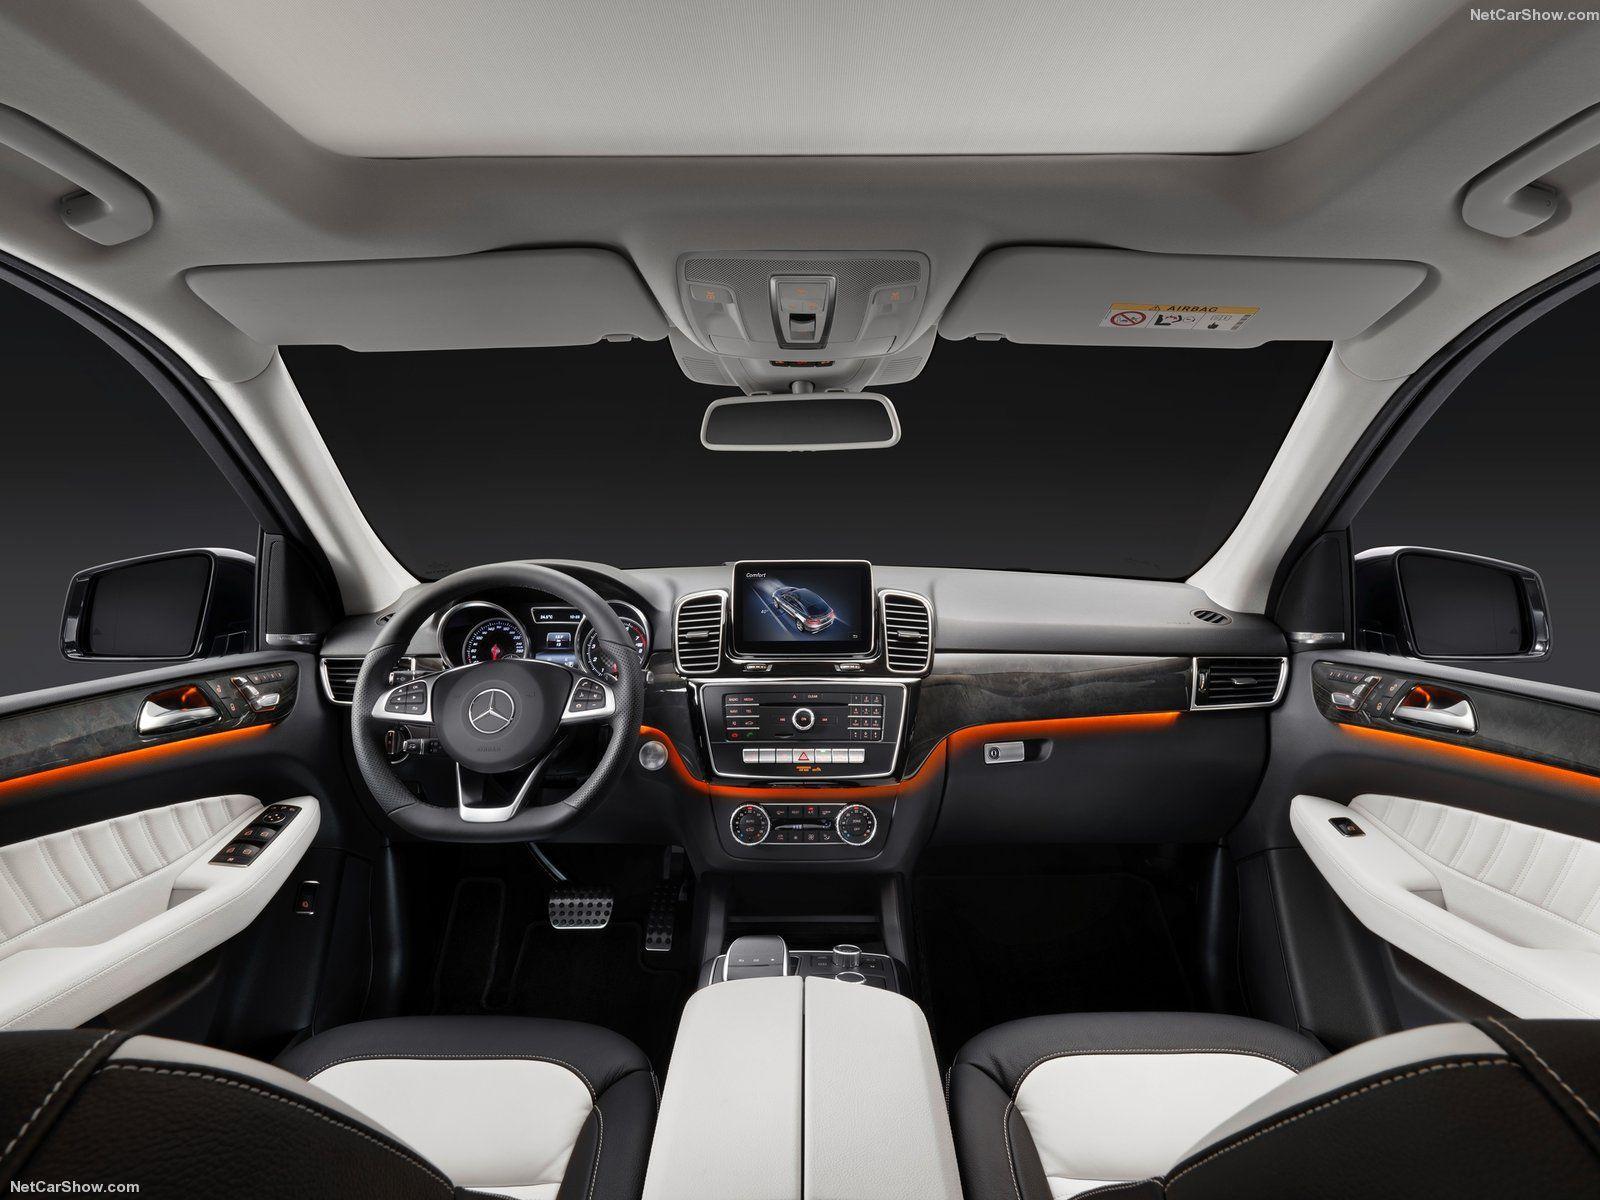 Gle Class Interior Mercedes Benz Gle Mercedes Benz Mercedes